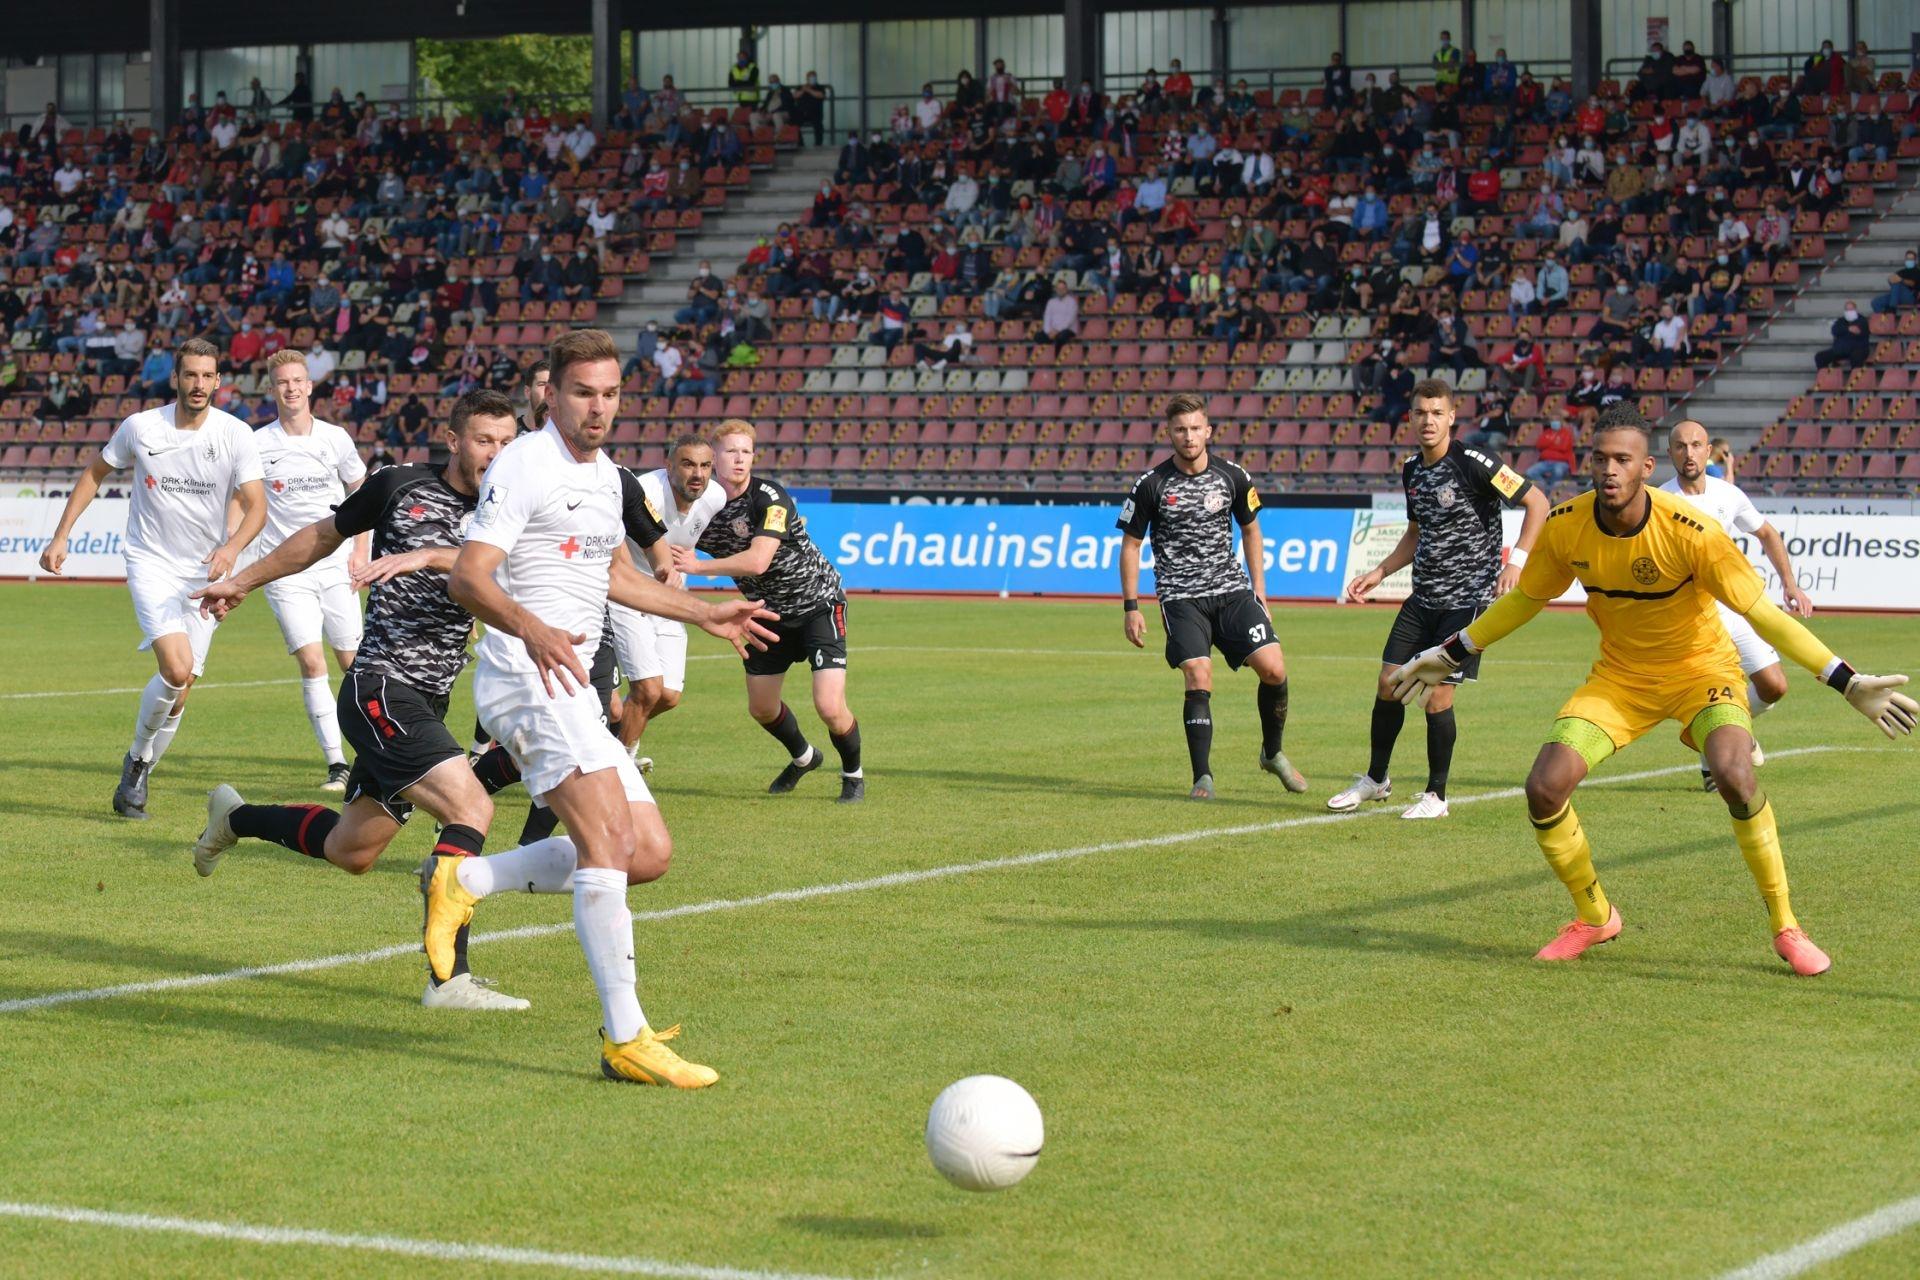 Regionalliga Südwest 2020/21, KSV Hessen Kassel, Rot-Weiss-Koblenz, Endstand 1:1, Pichinot